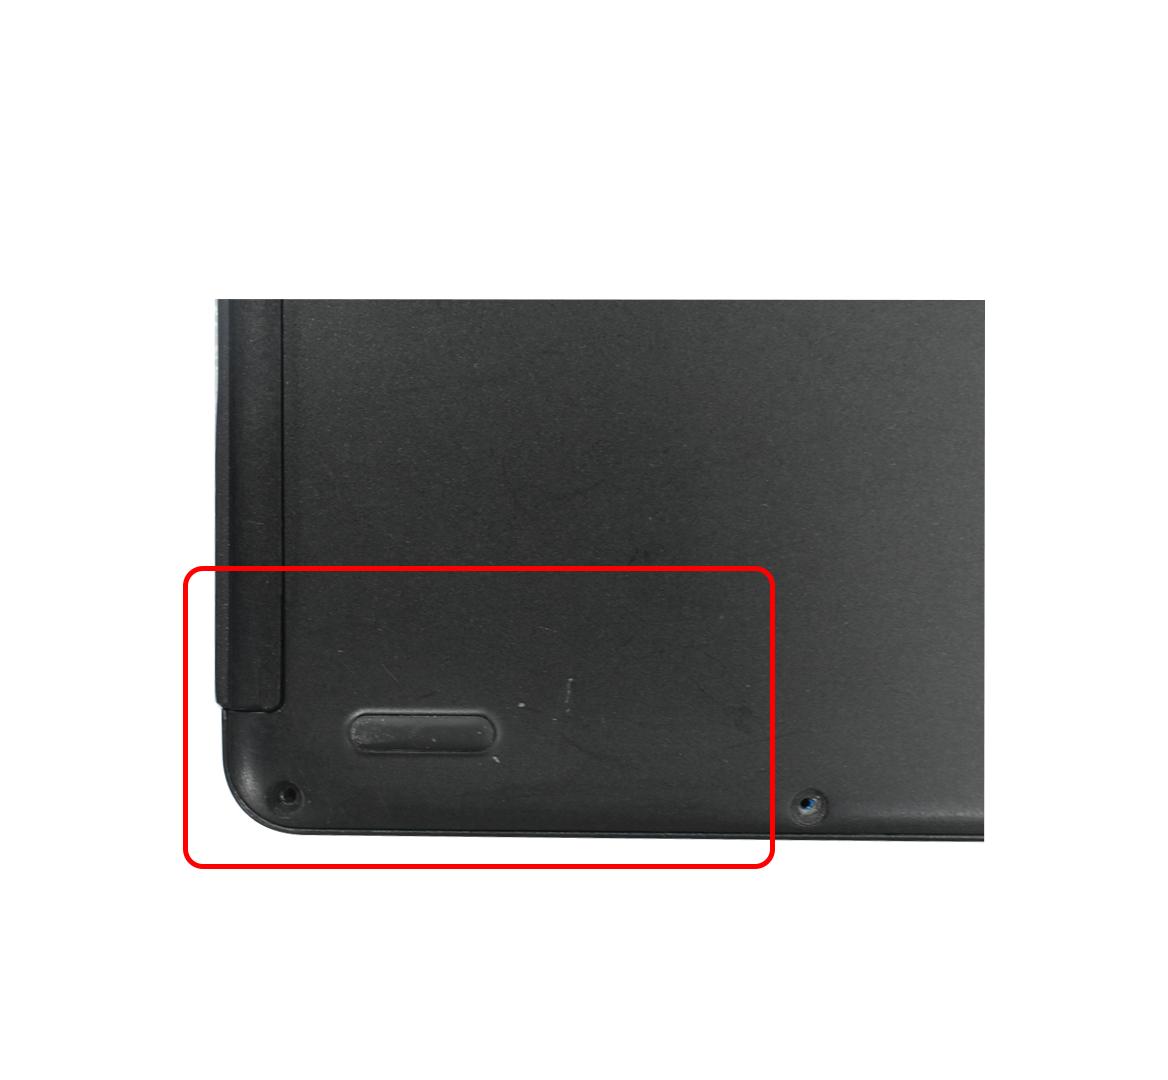 Lenovo T470 Business Laptop, Intel Core i5-7200U, 8GB DDR4 SODIMM RAM, 128GB SSD M2, 14 Touch Display, Windows 10 pro (Refurbished)